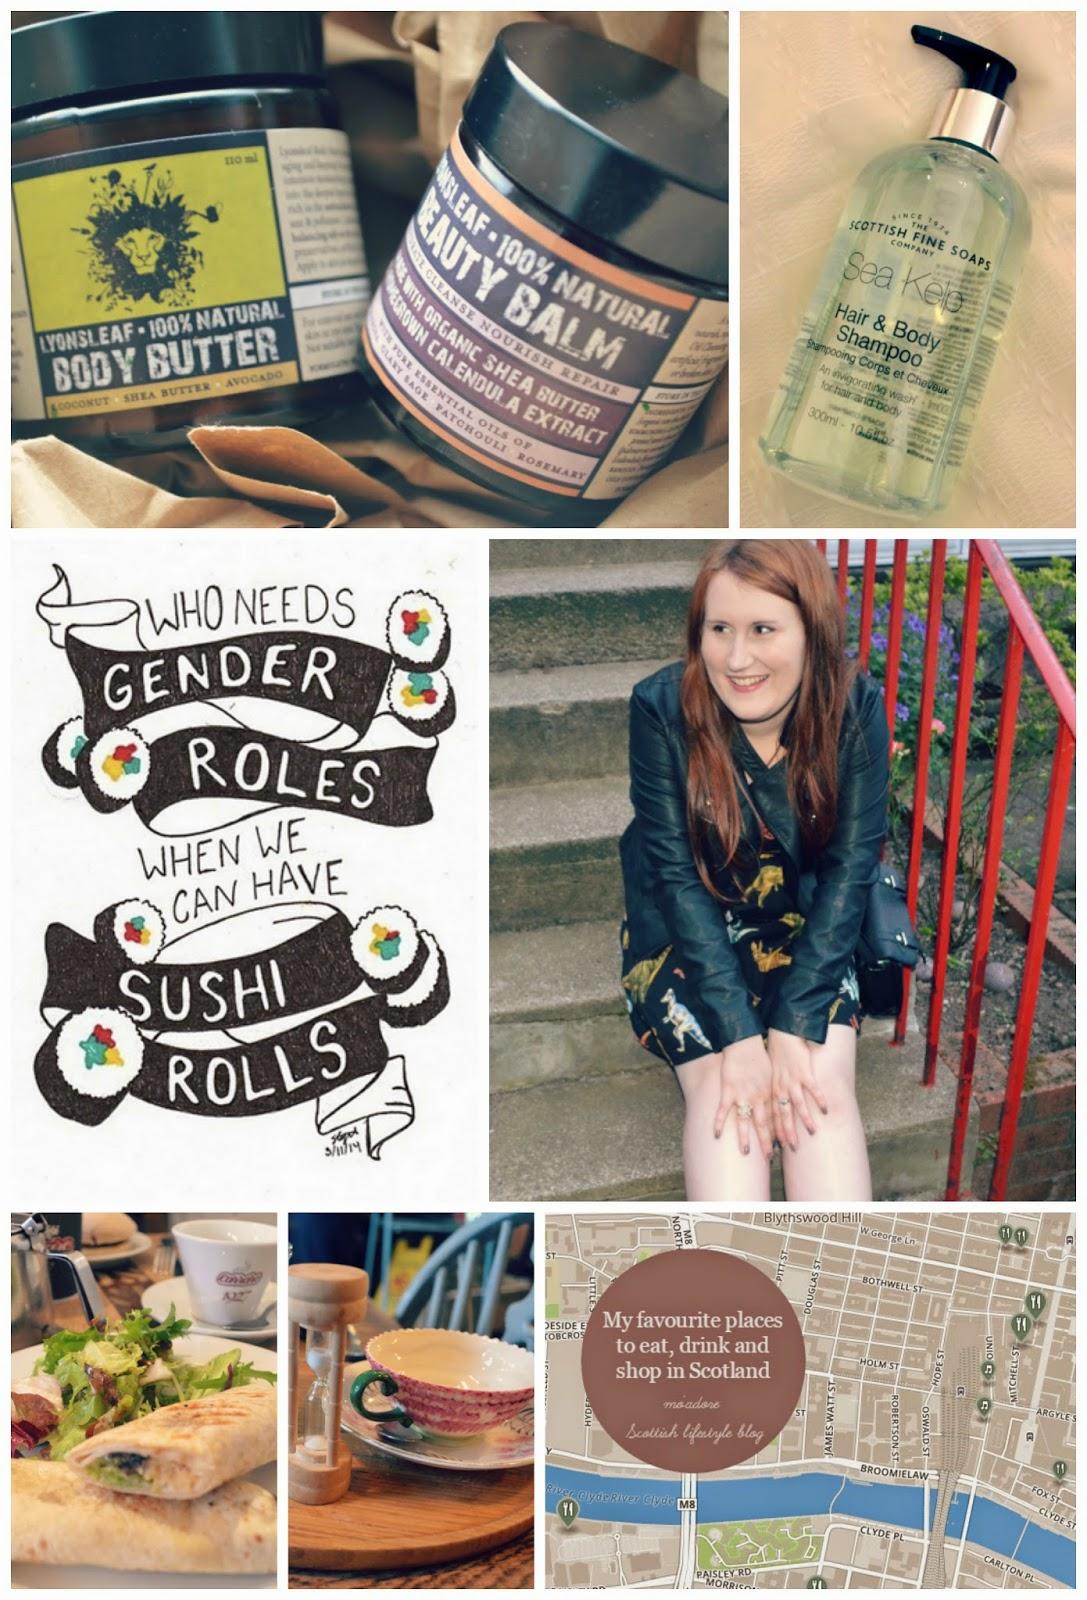 blogger crush, favourite blogger, Scottish blogger, cruelty free blogger, vegan blogger